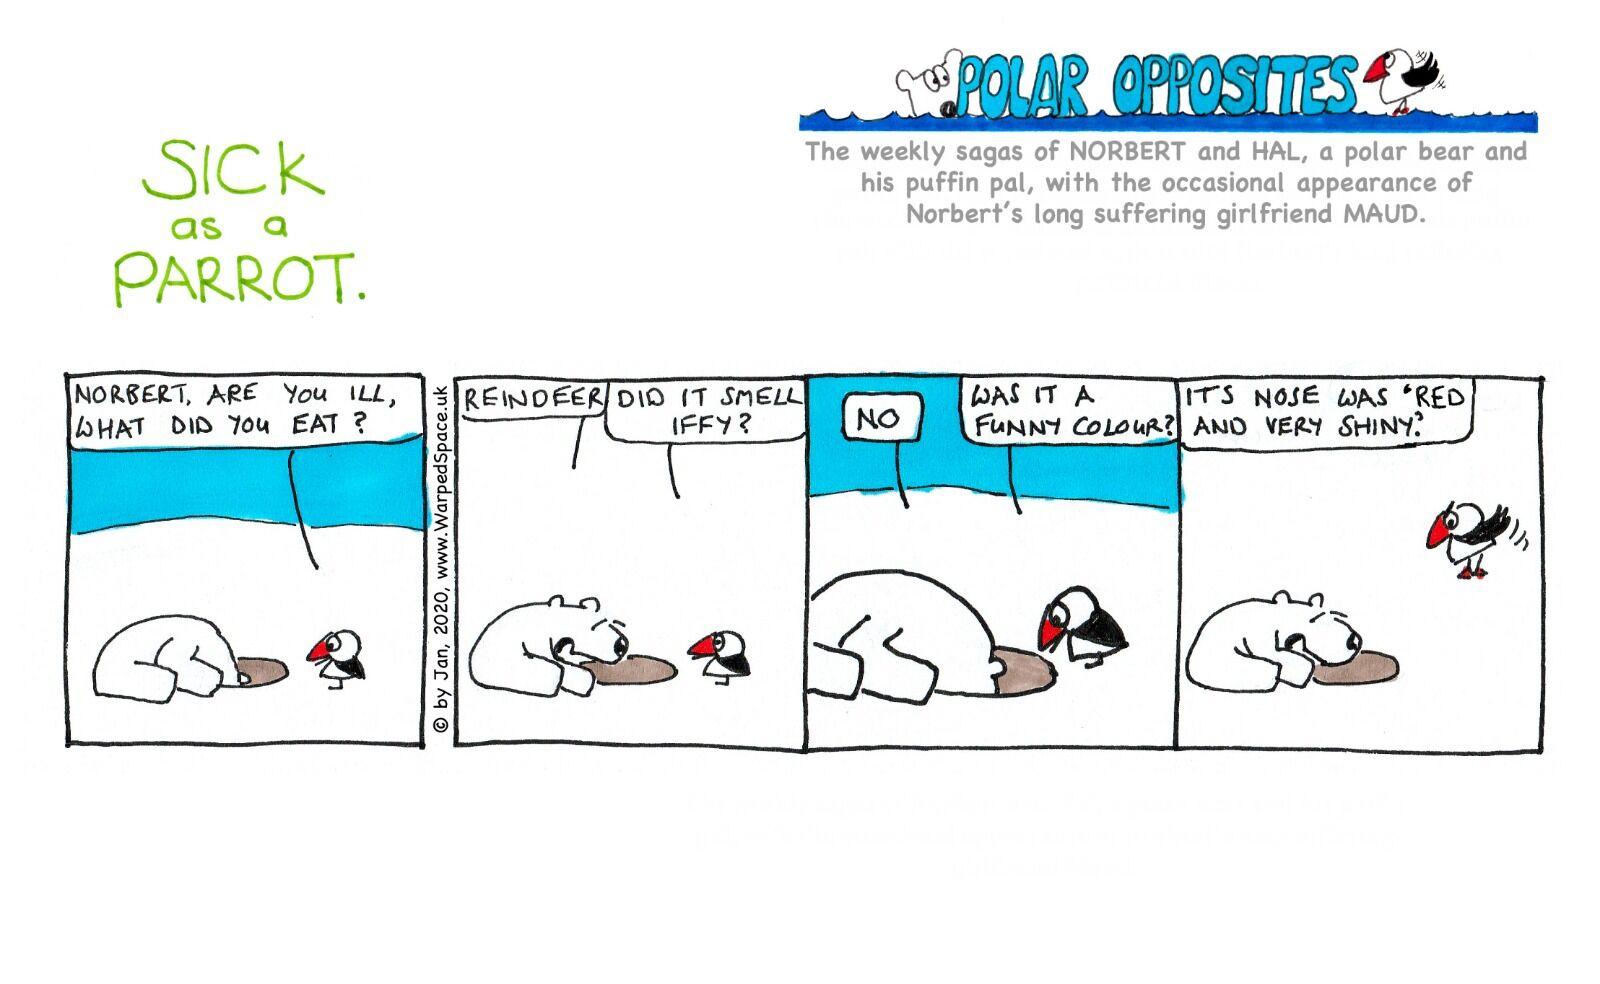 Week 53 - Sick as a Parrot